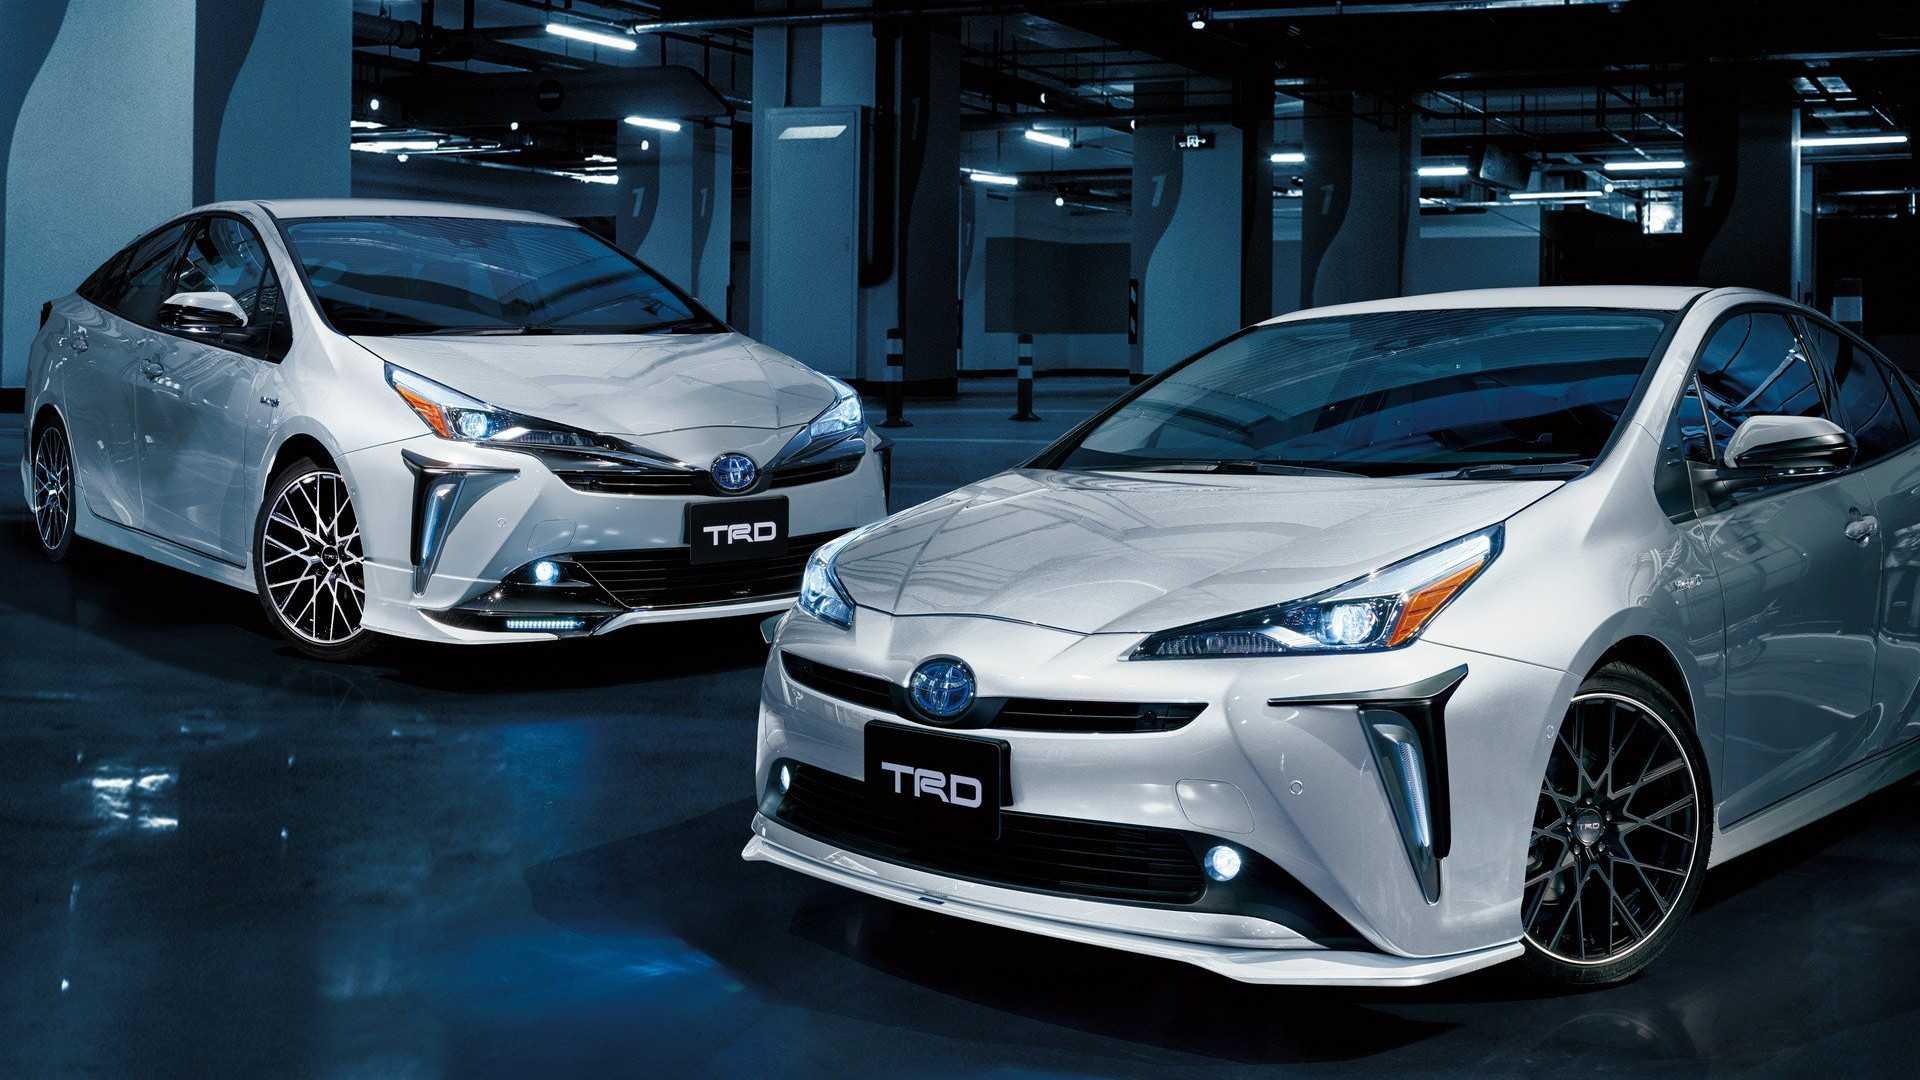 TRD превратил гибридный седан Toyota Prius в спорткар 1